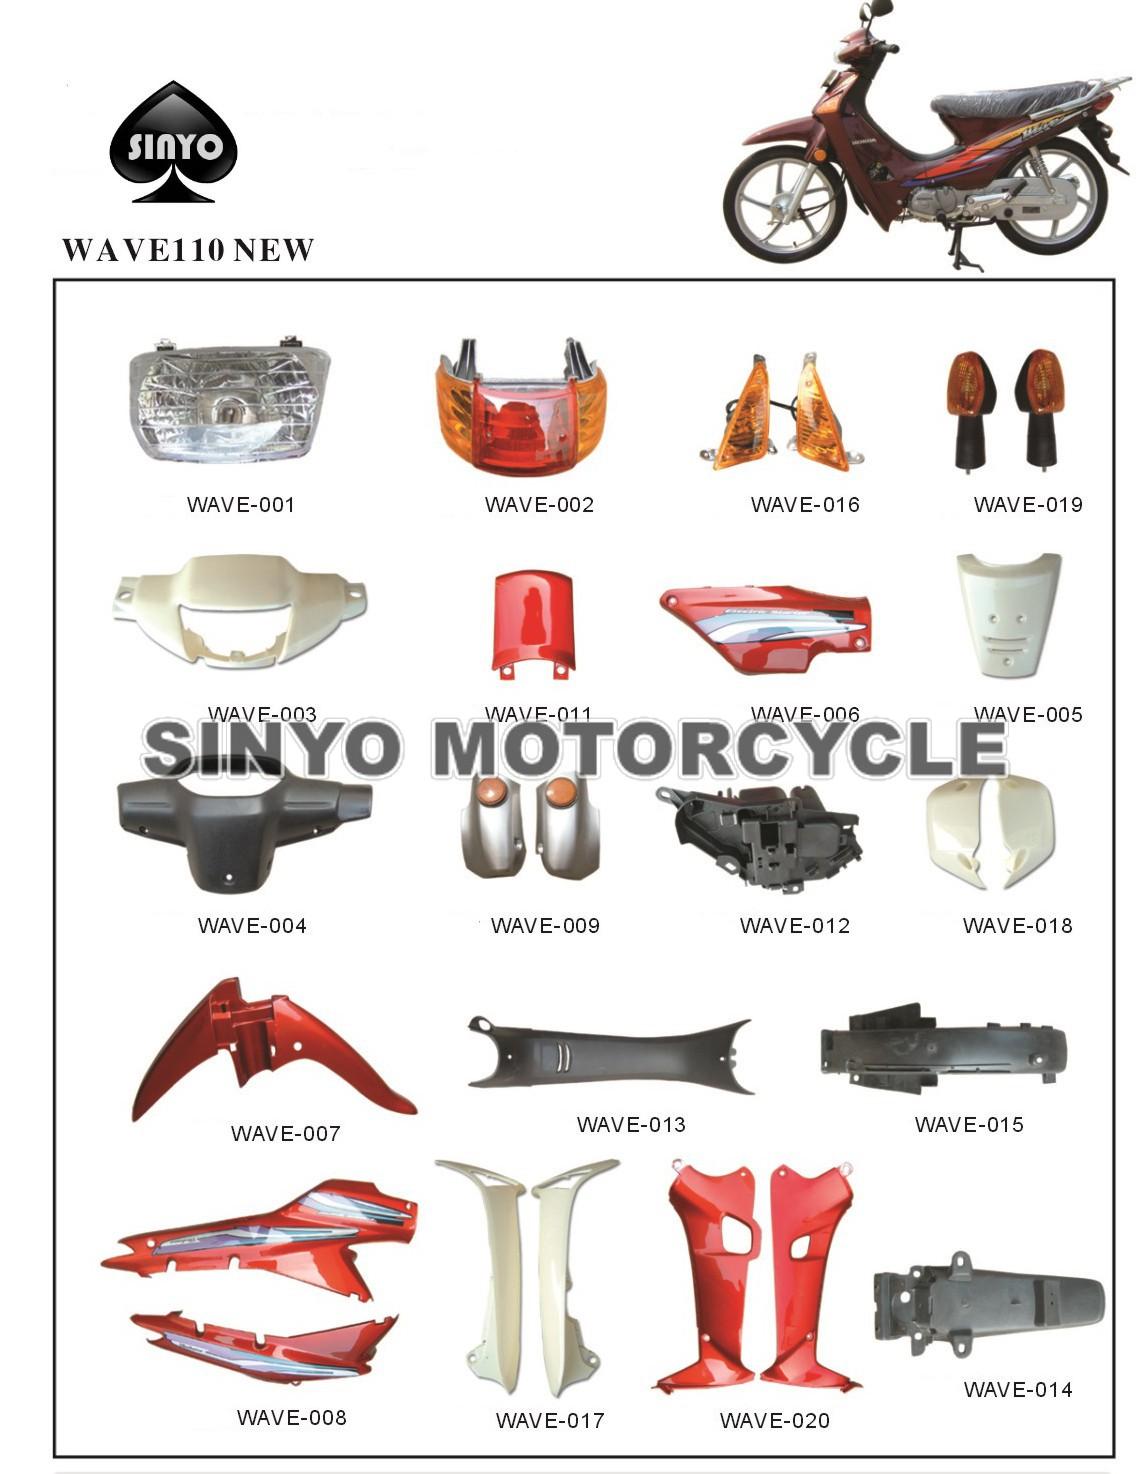 Honda clipart honda wave Parts Wing Co Motorcycle Ltd